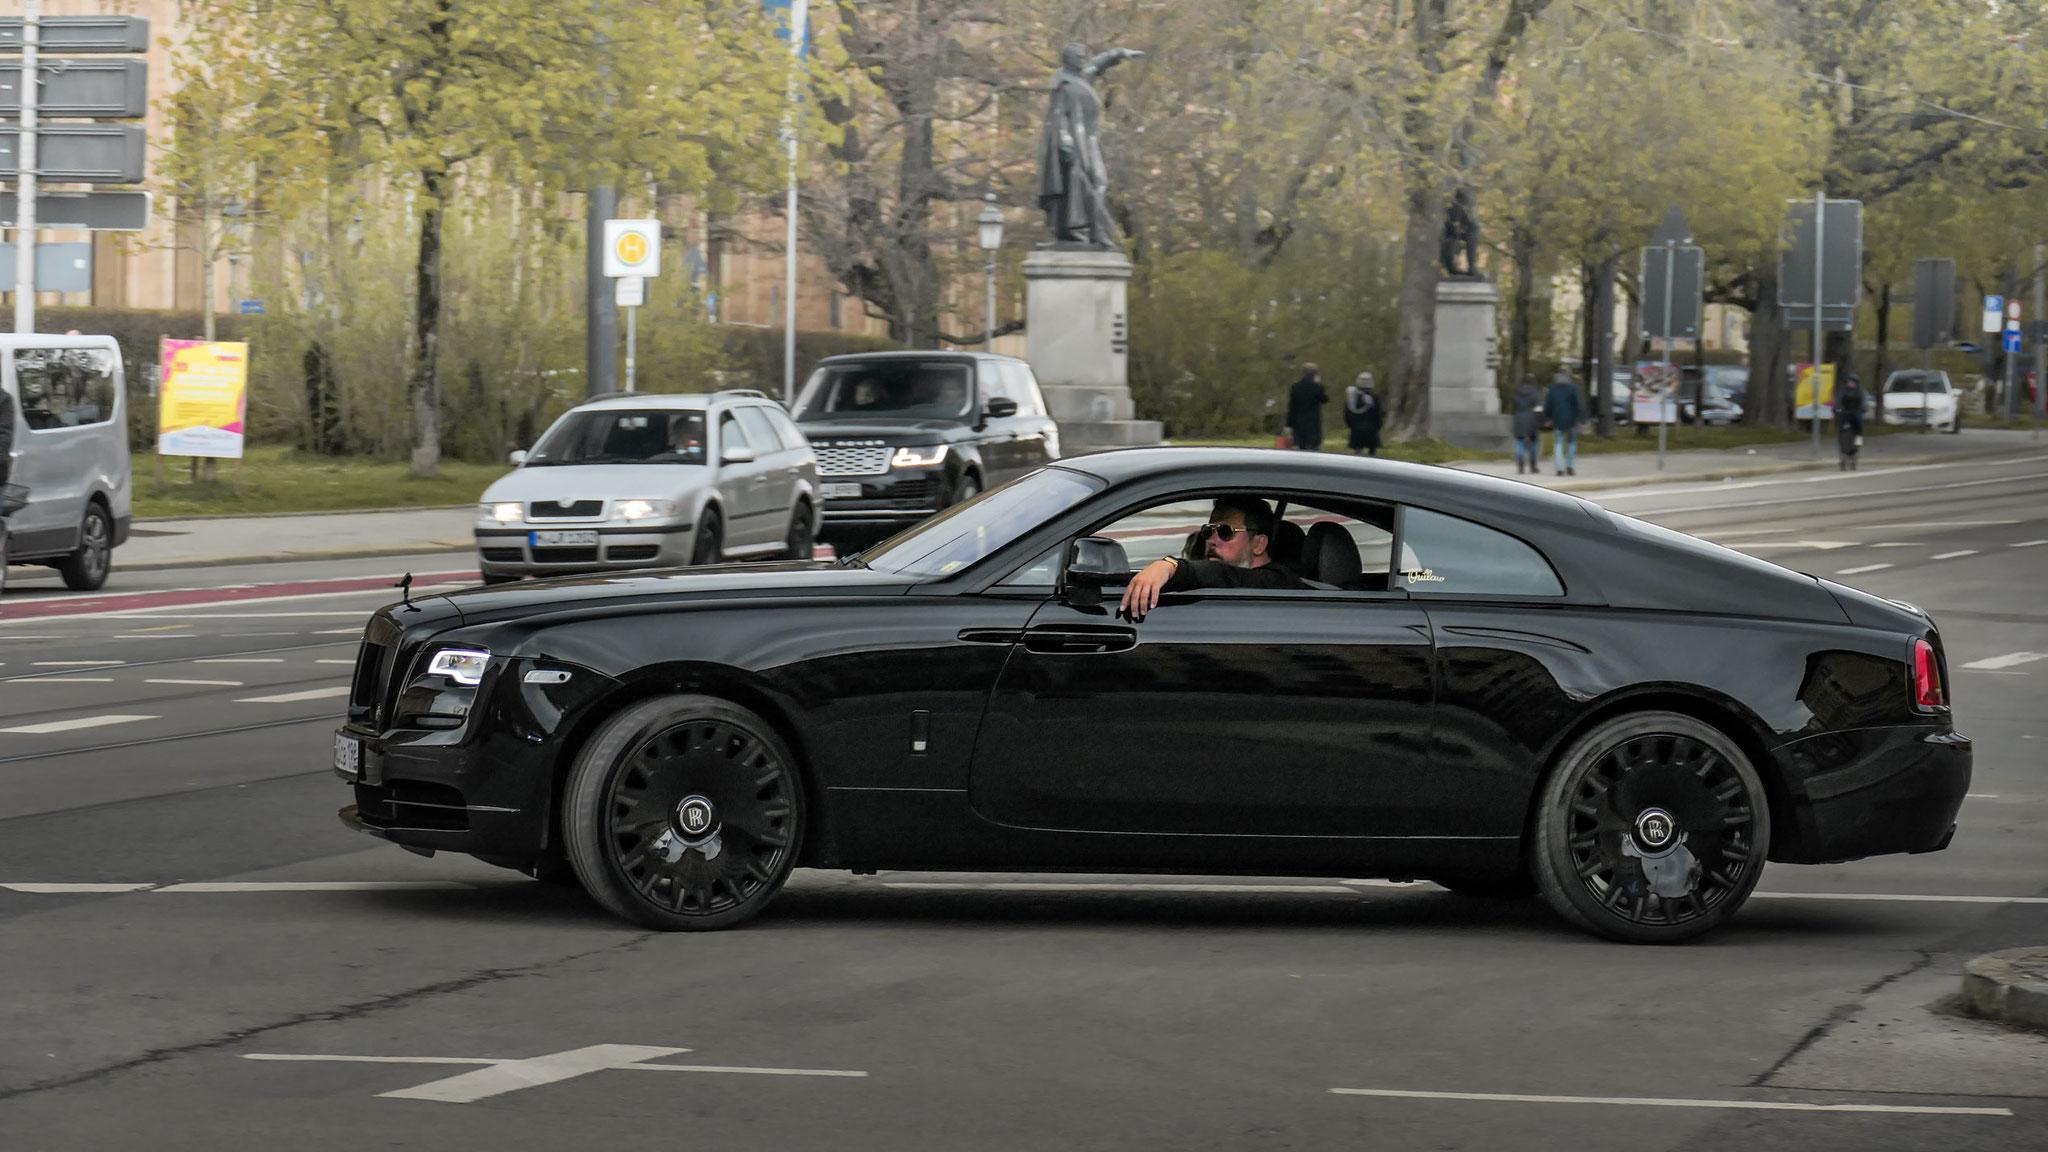 Rolls Royce Wraith - O-465-CB-198 (RUS)